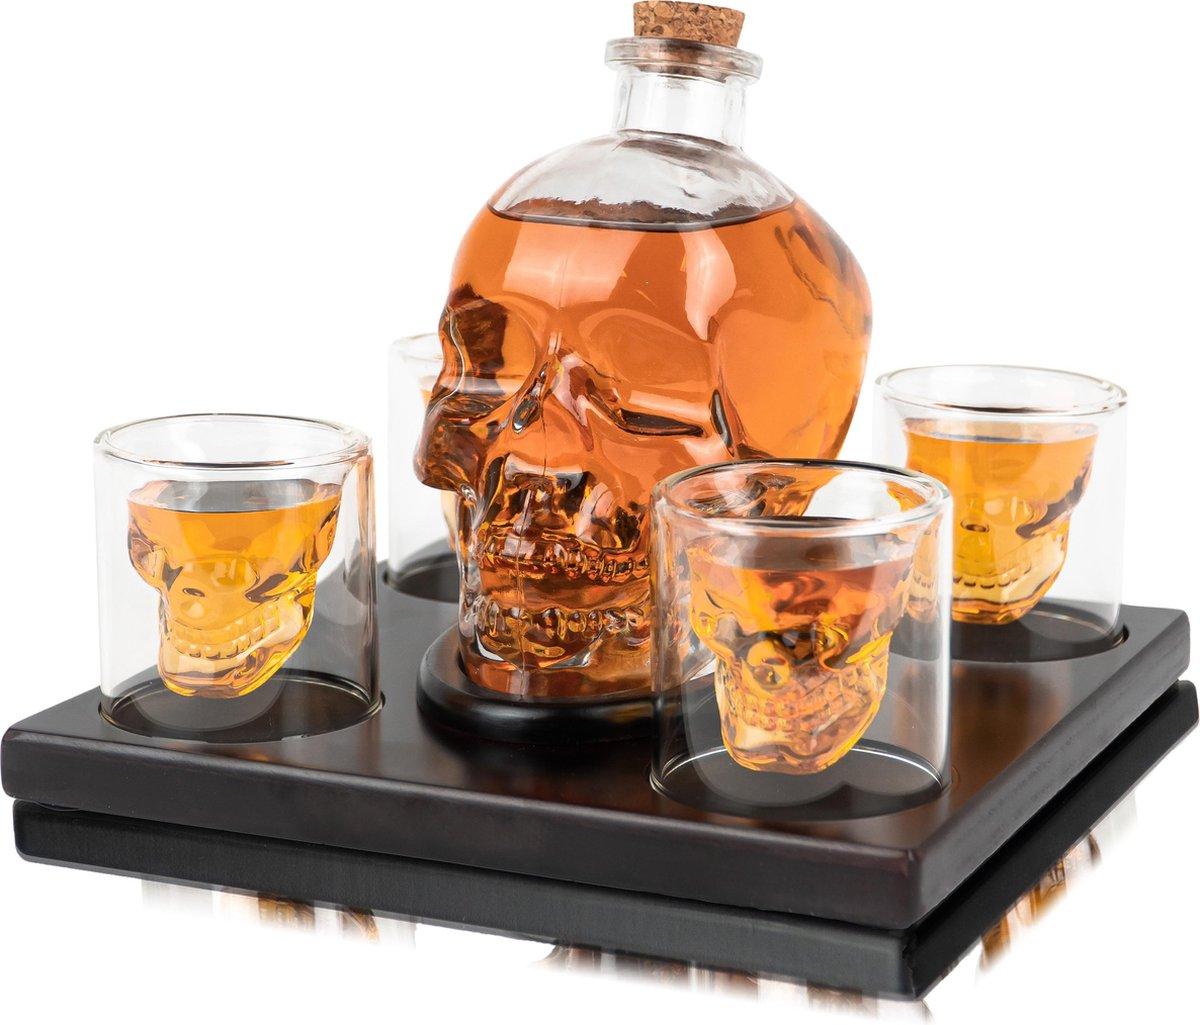 Whisiskey  Whiskey Karaf - Skull - Luxe Whisky Karaf Set - 0,9 L - Decanteer Karaf - Whiskey Set - I